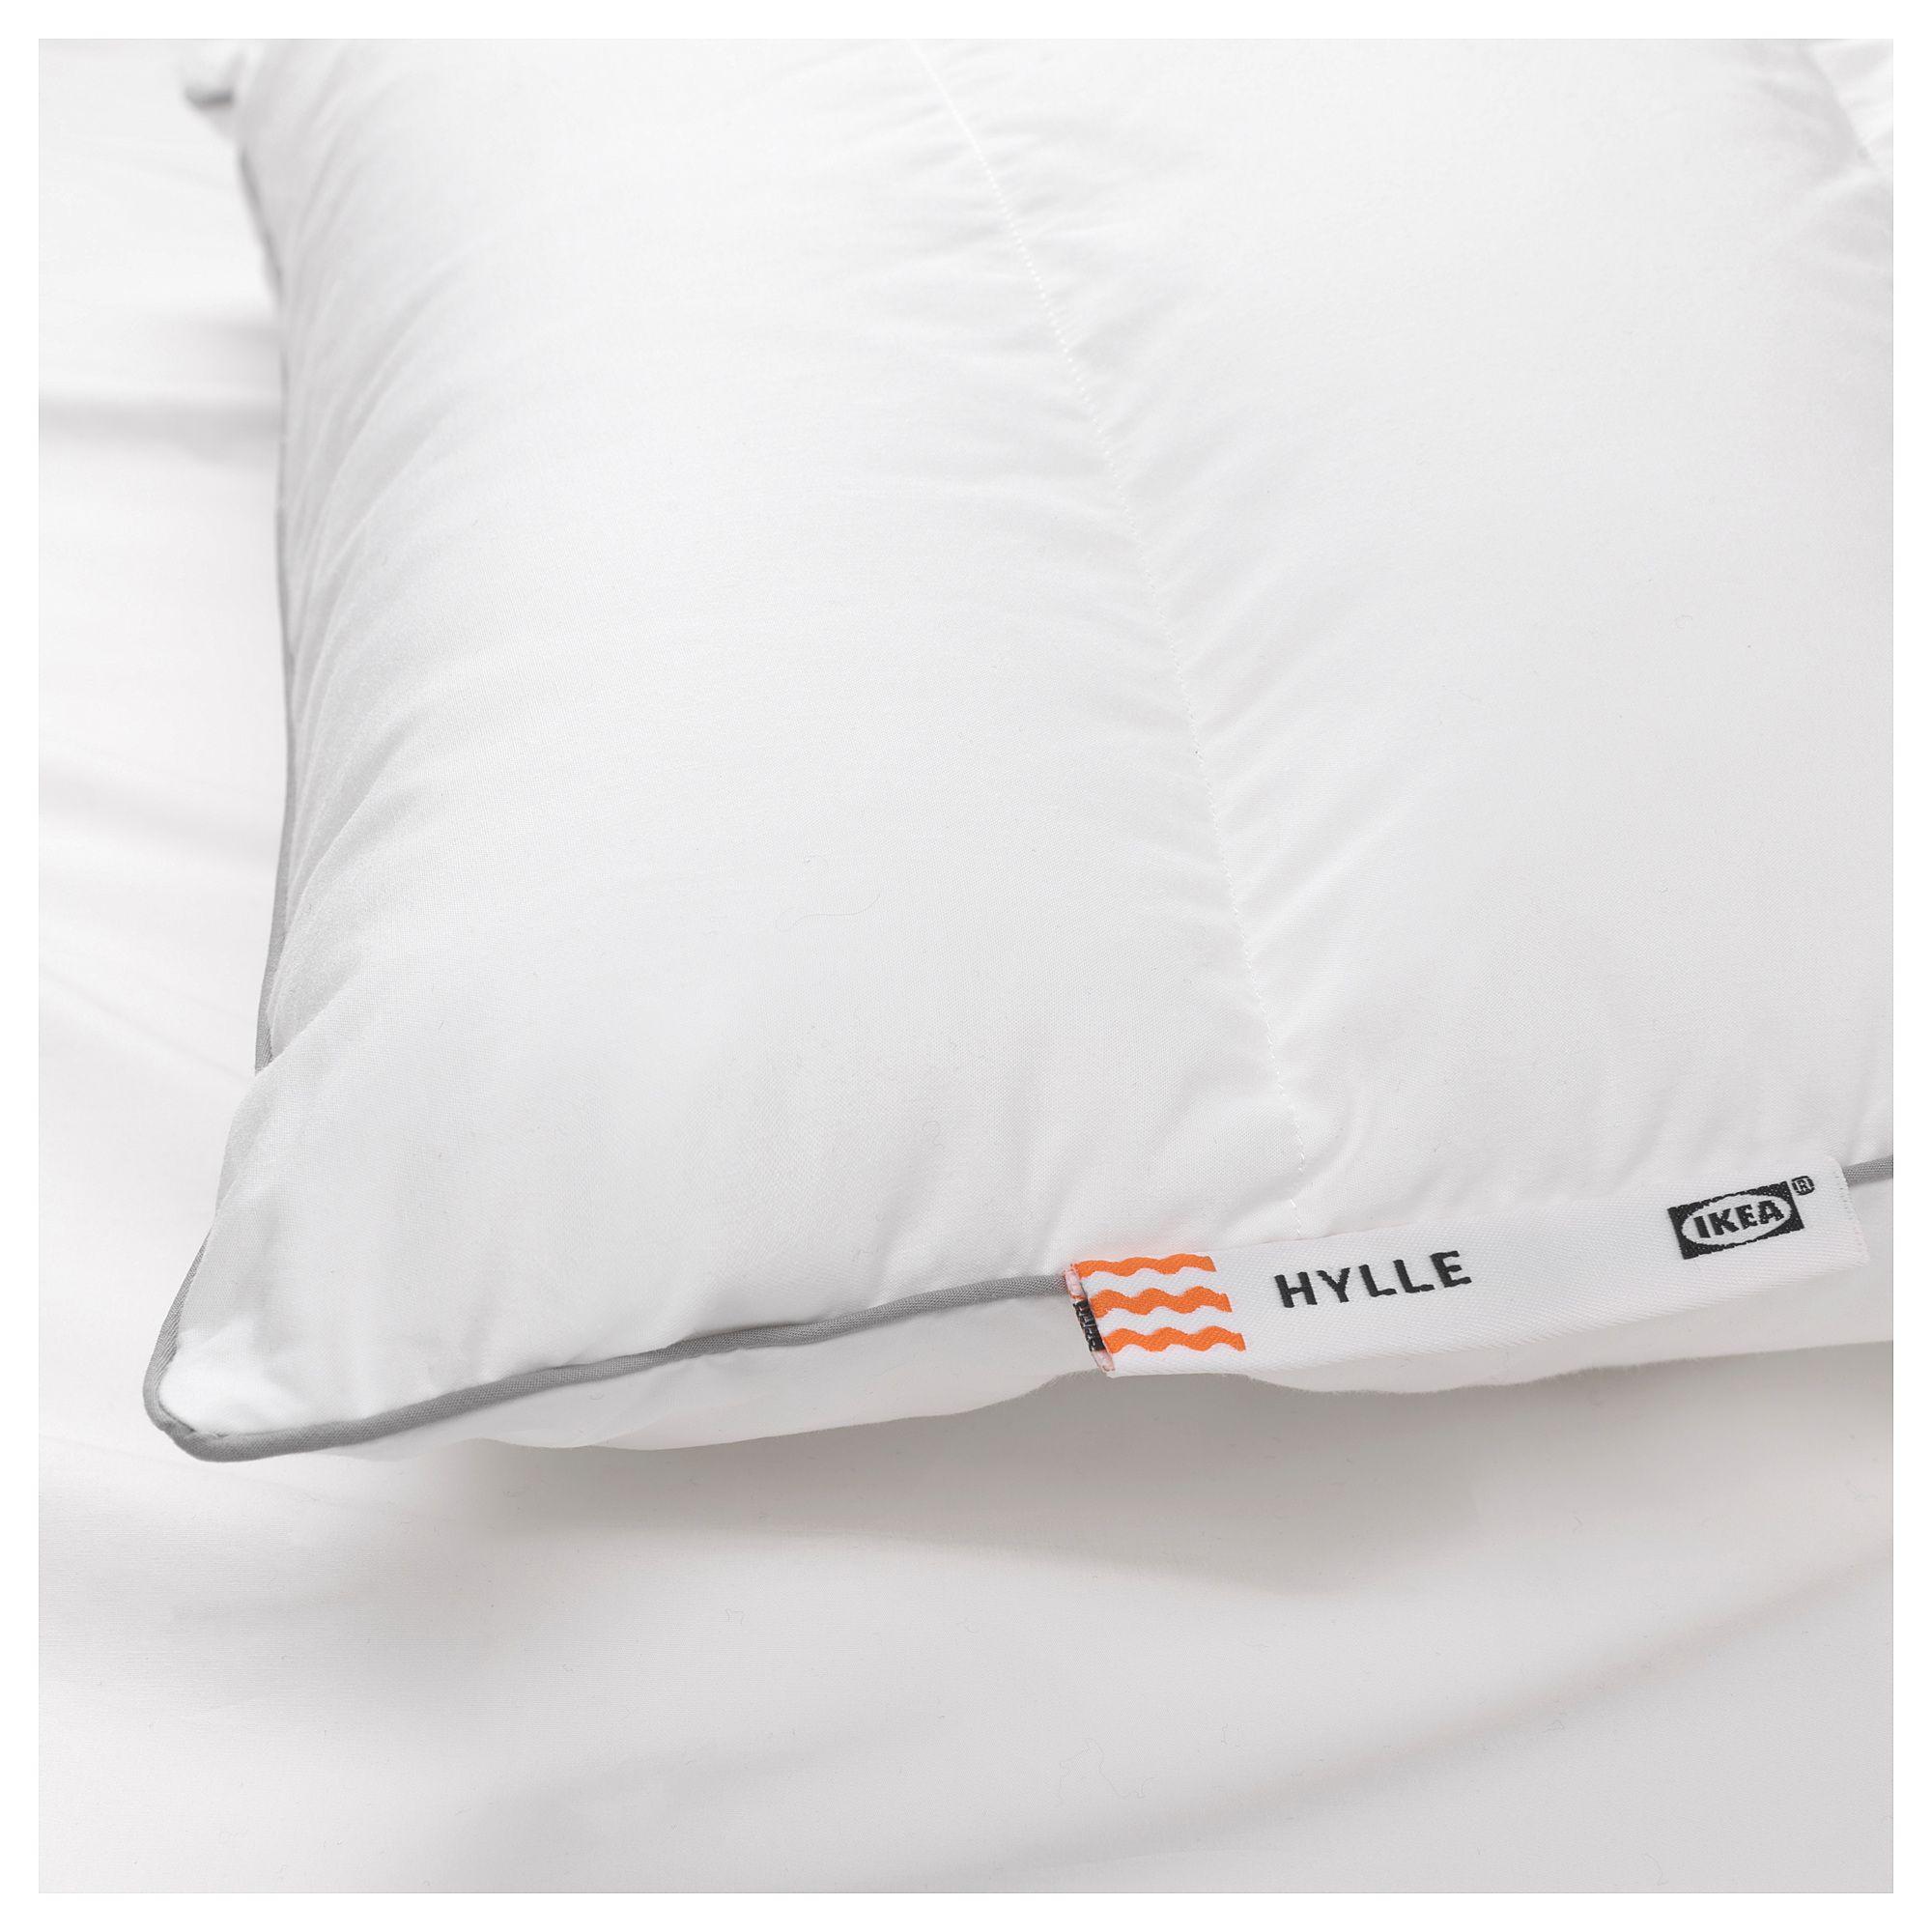 Pulire Materasso Memory Foam hylle pillow, softer king | pillows, beige bed linen, black